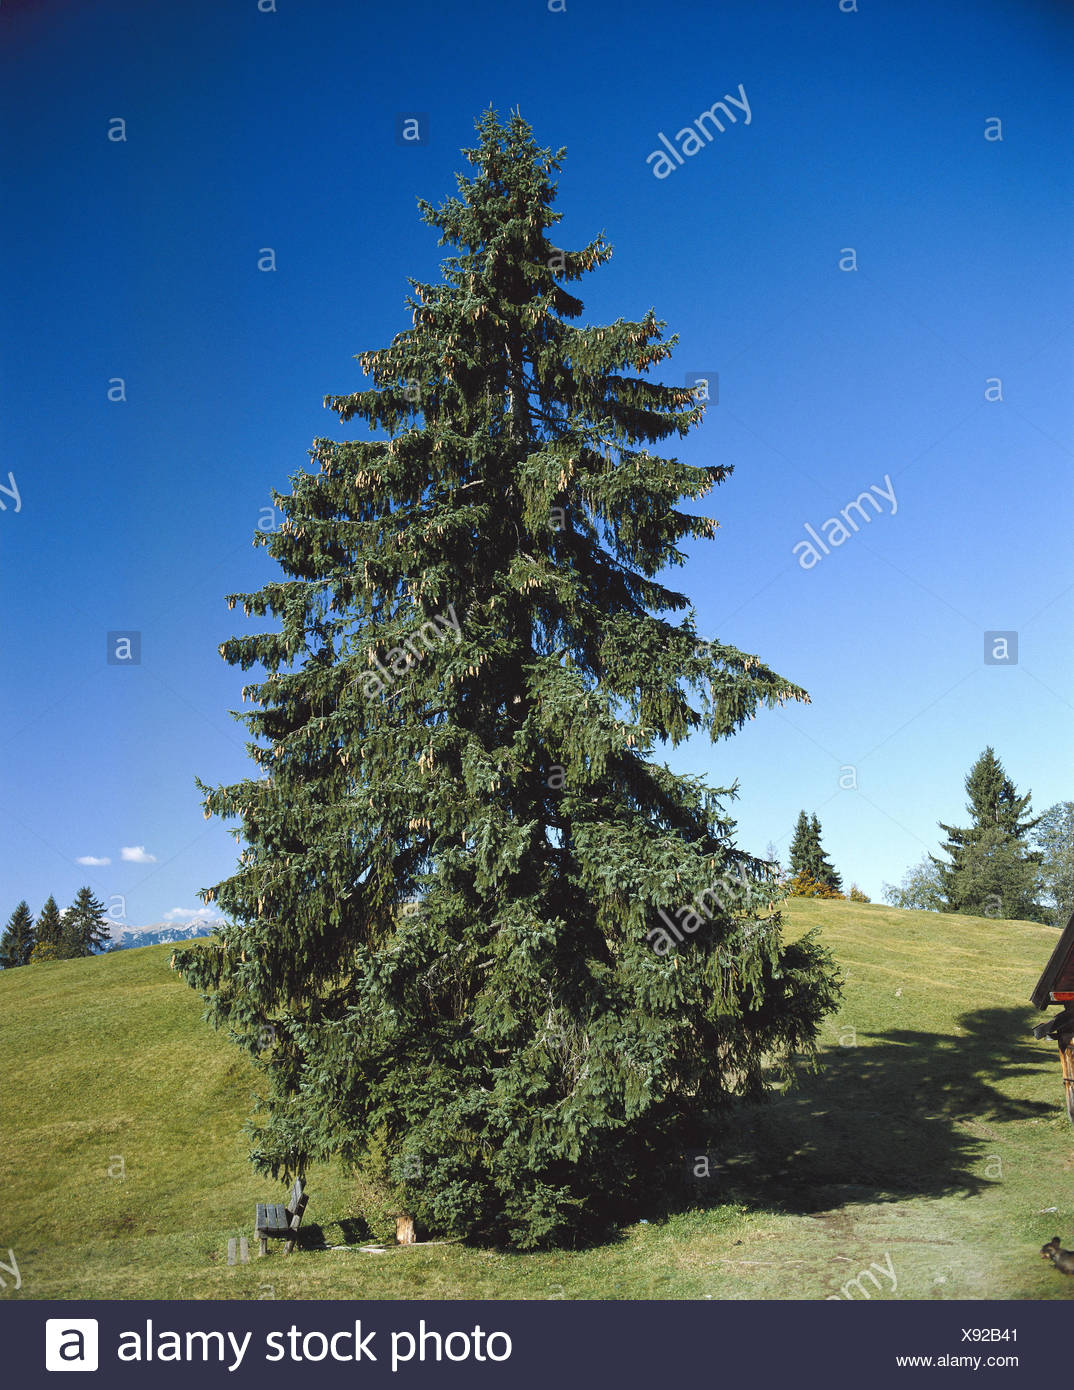 Super Berglandschaft, Fichte, Picea, Sommer, Landschaft, Alm, Wiese #XN_92